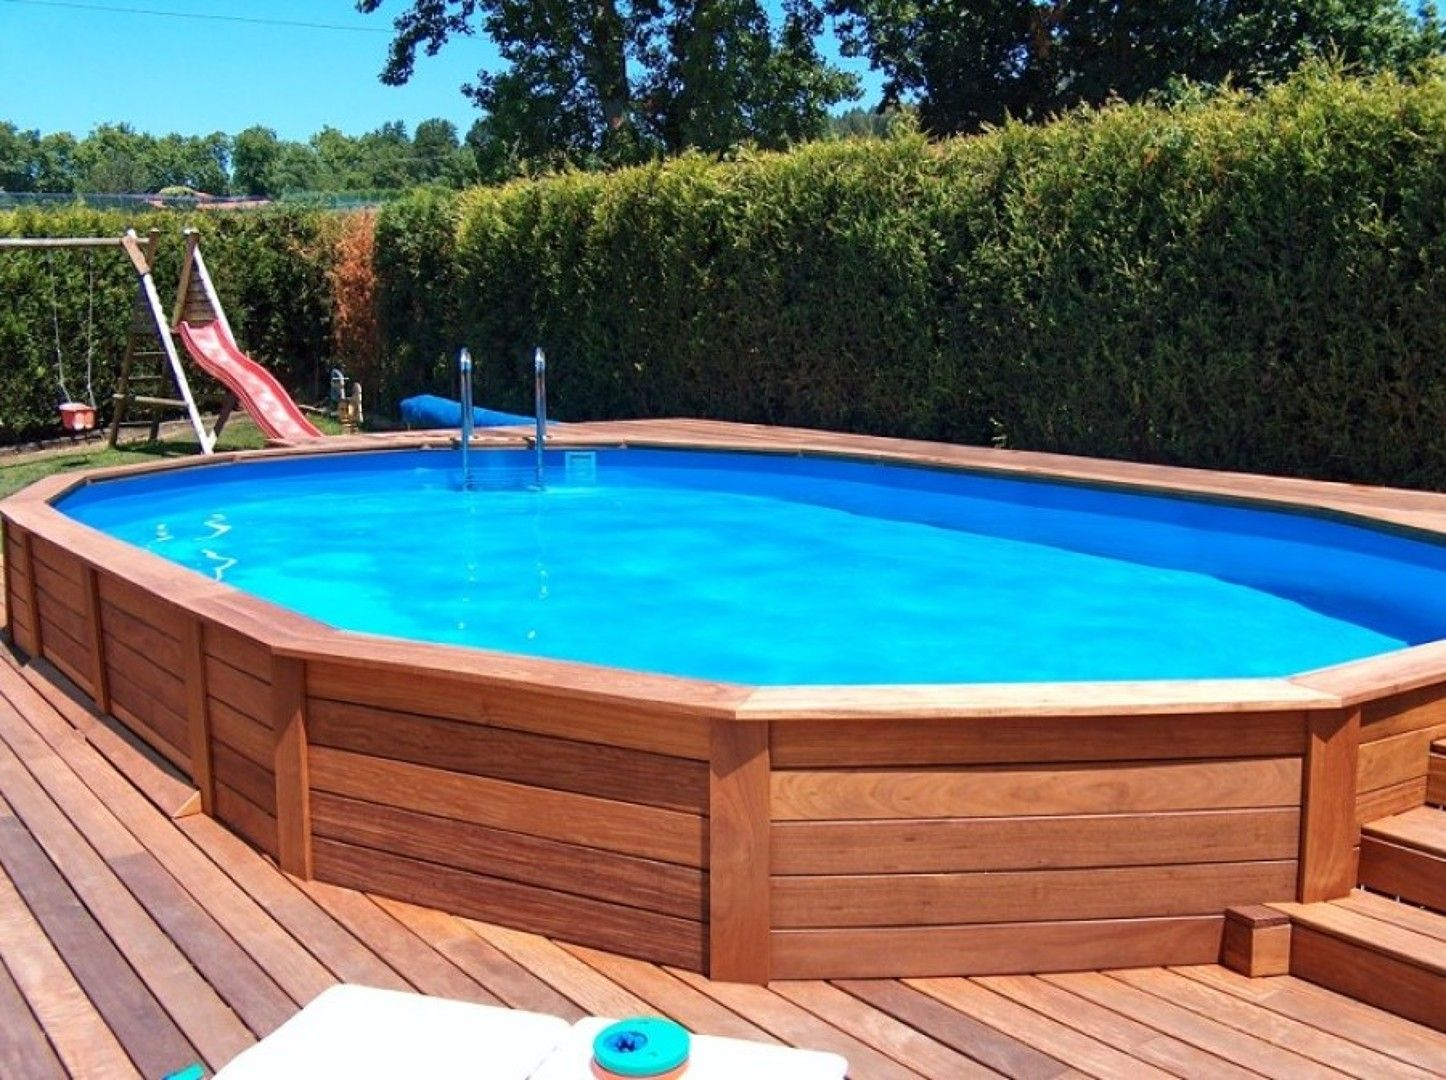 Piscina madera jardines pinterest piscinas madera y for Piscina madera pequena